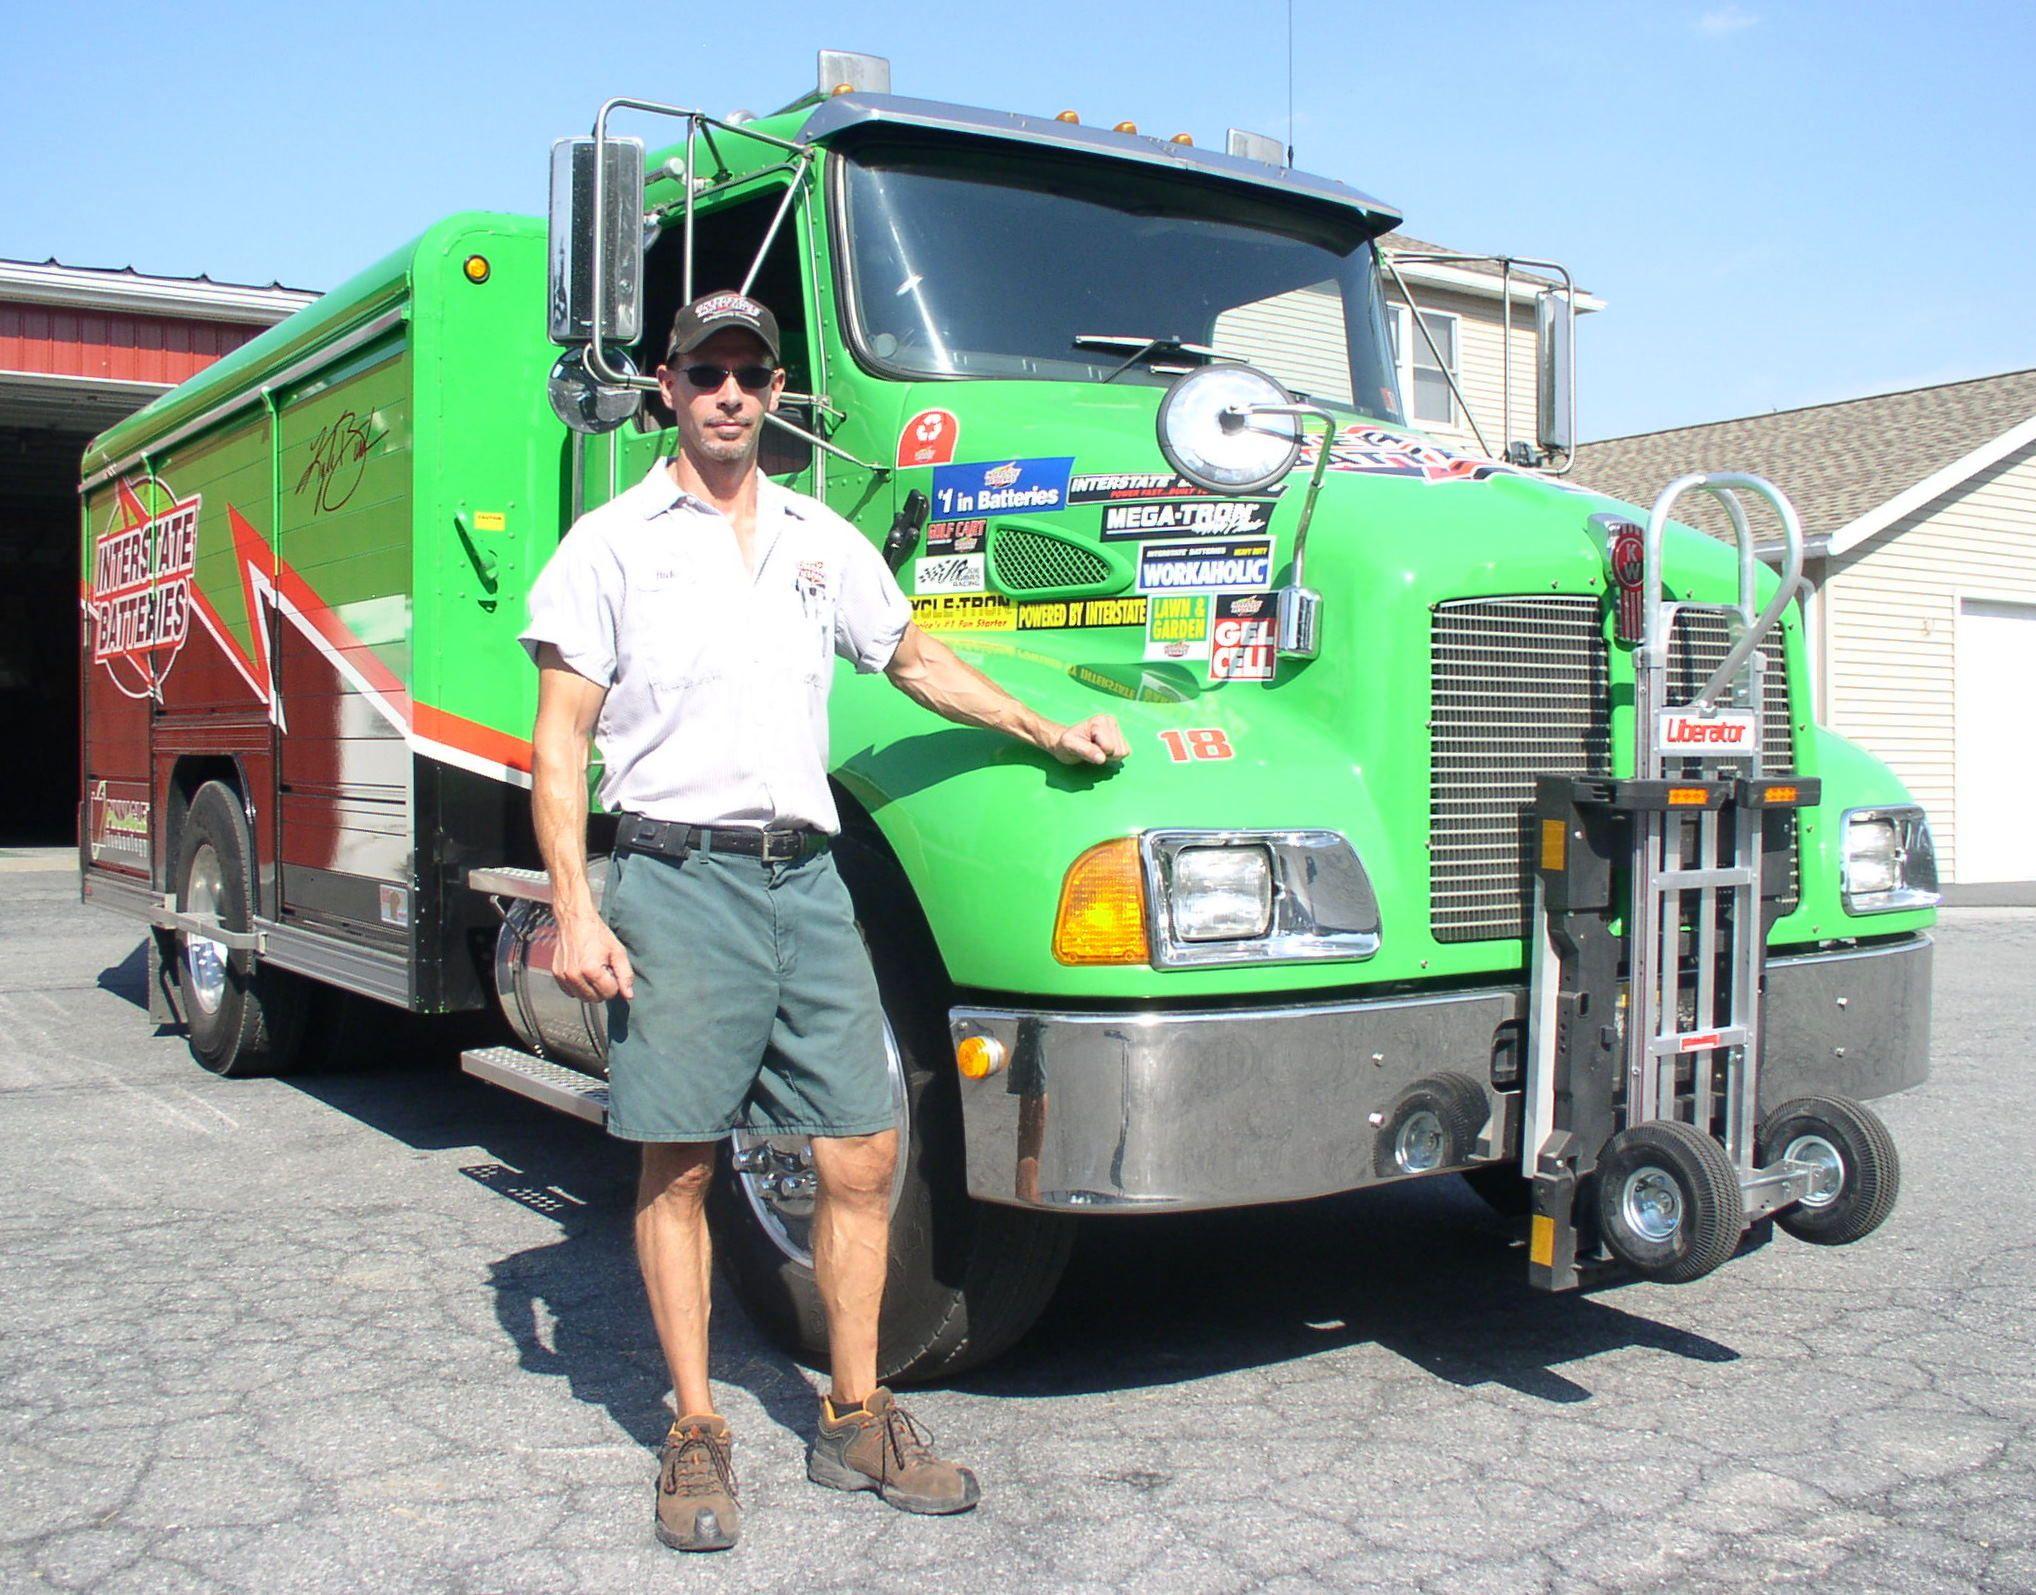 Interstate Battery Of Allentown Pennsyslvania Hand Trucks Truck Transport Trucks